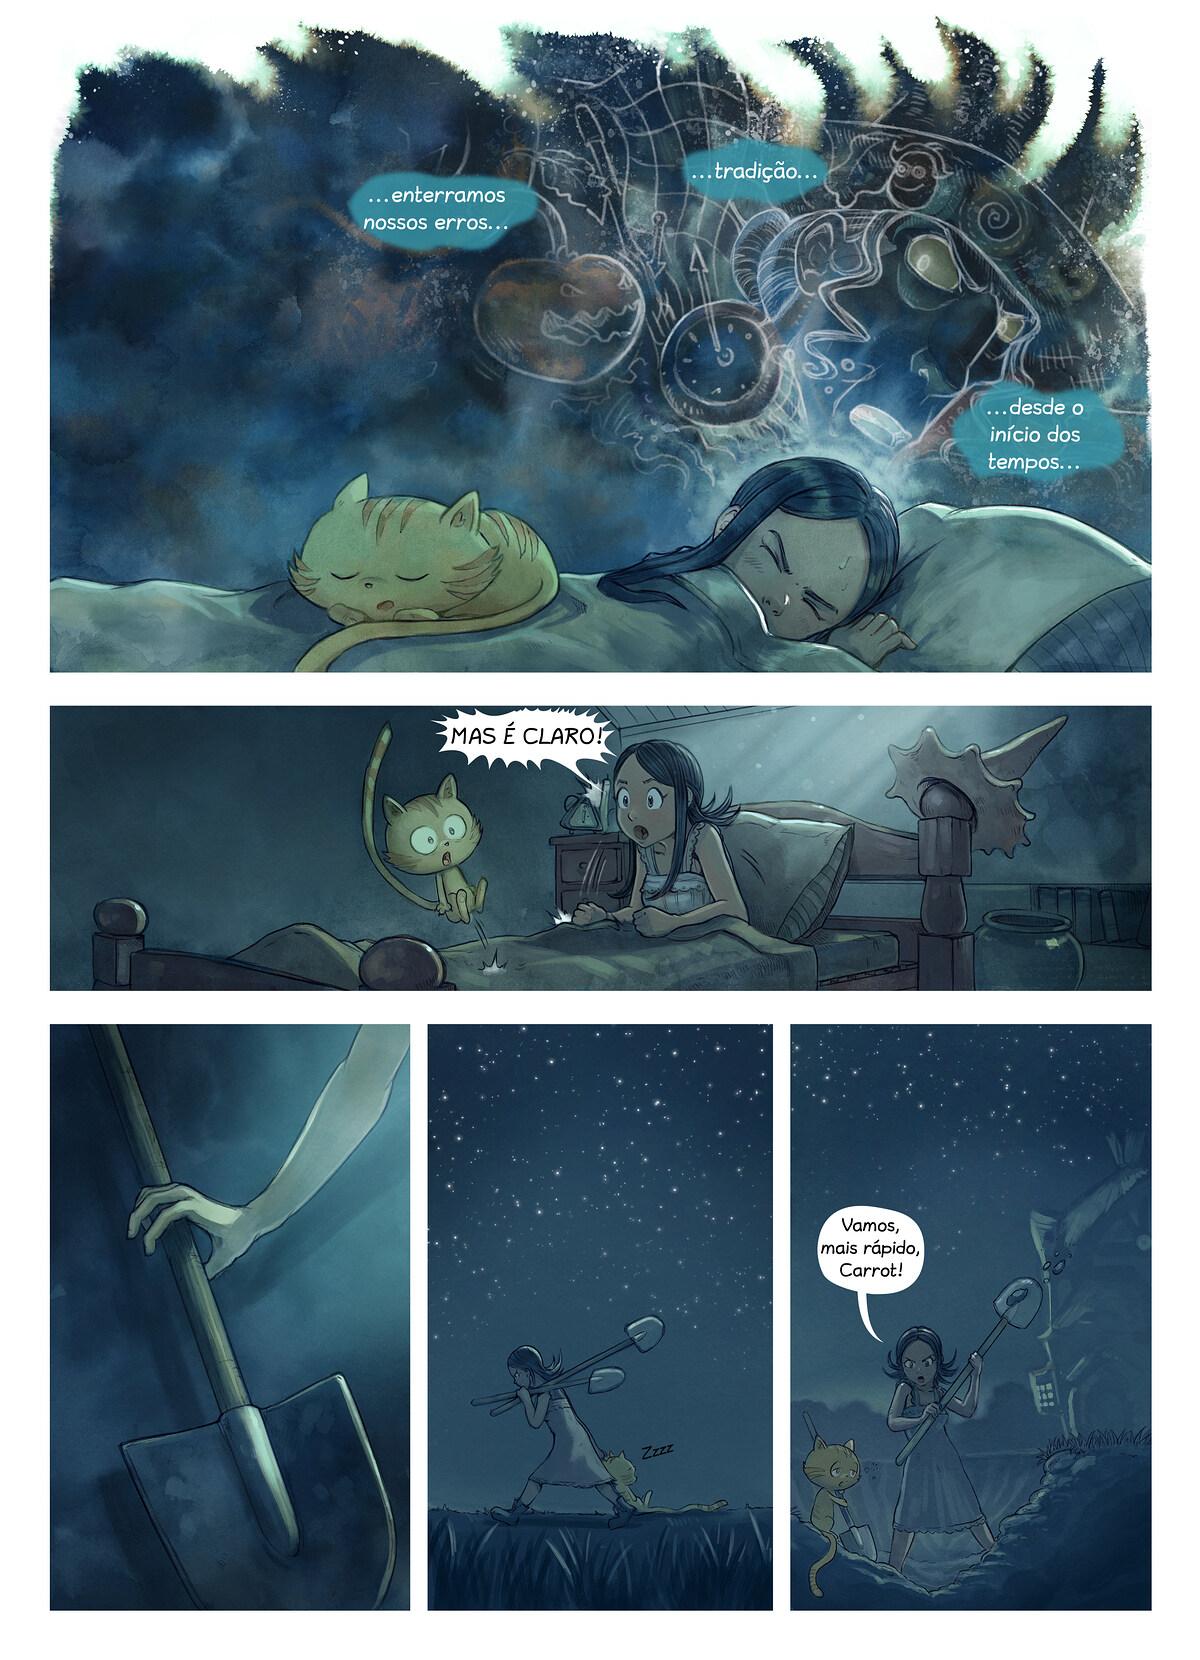 A webcomic page of Pepper&Carrot, episódio 19 [pt], página 3